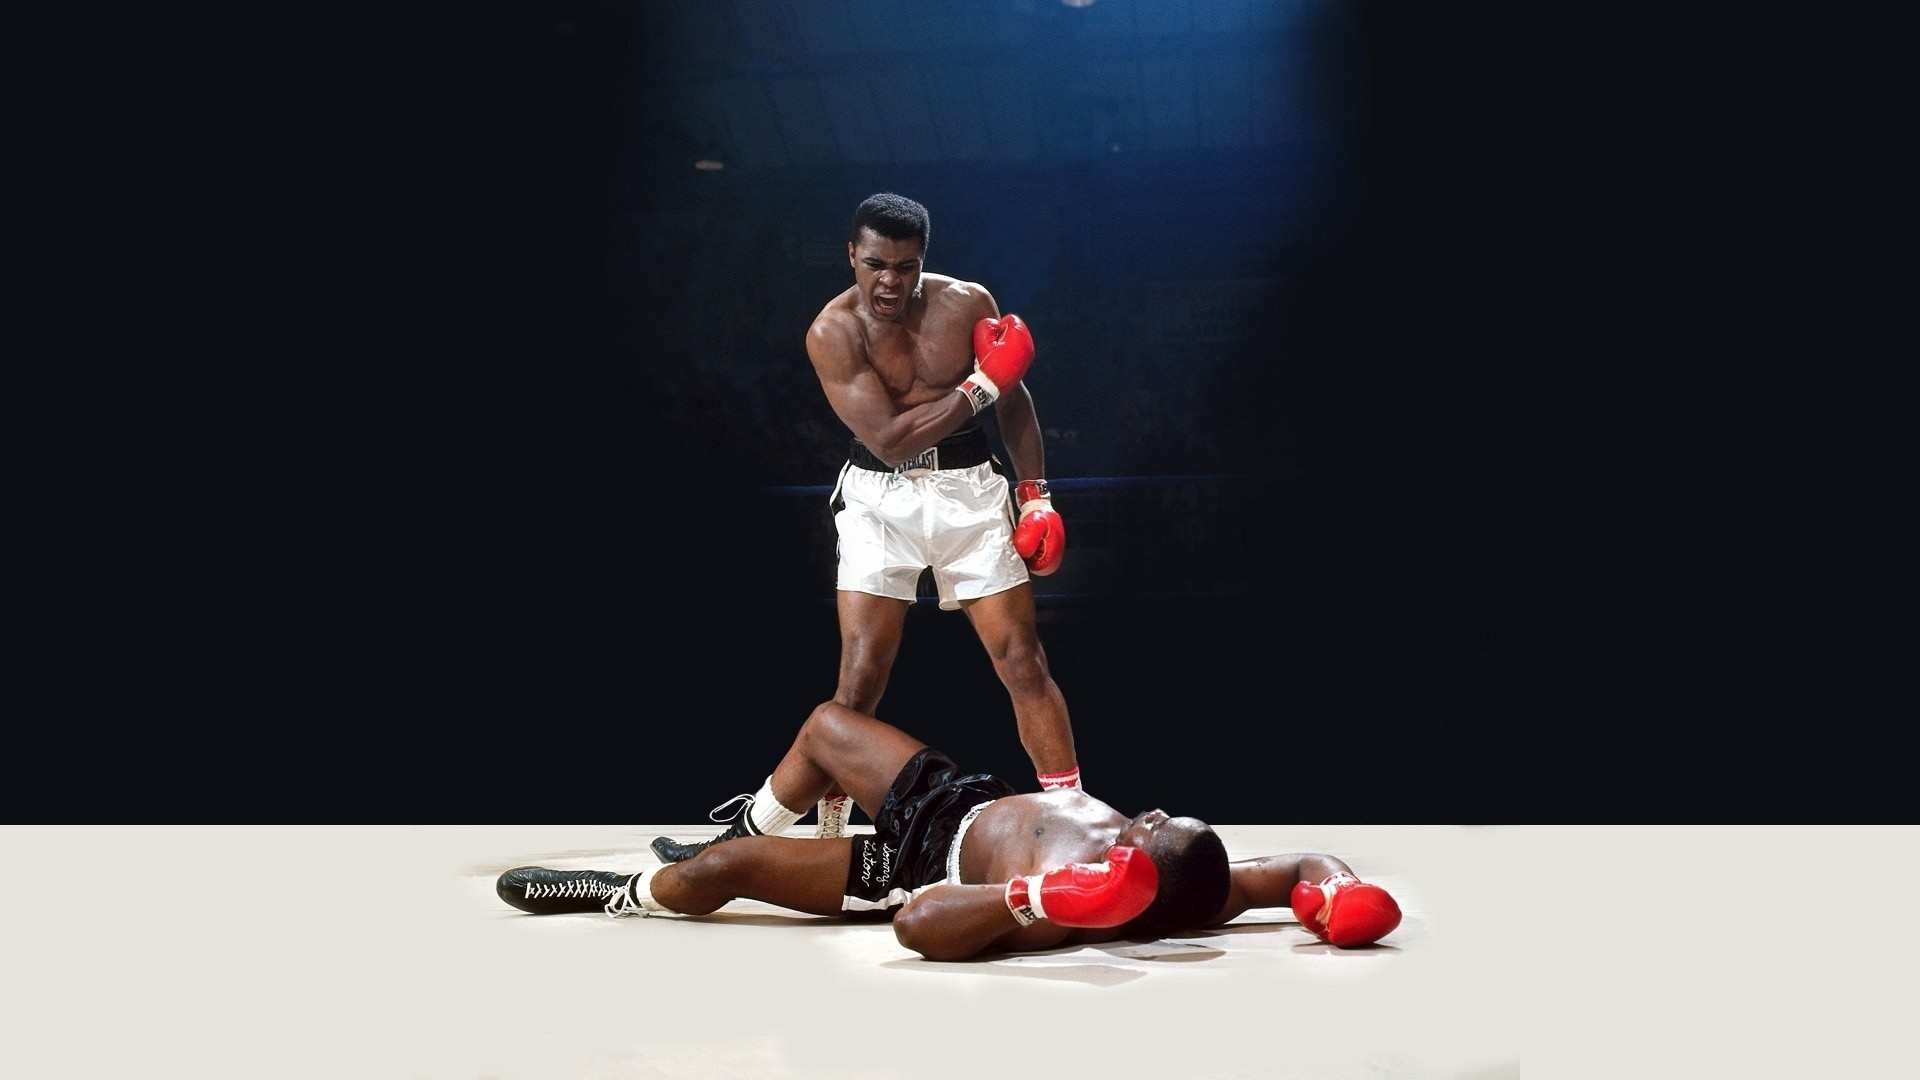 Sports / Muhammad Ali Wallpaper